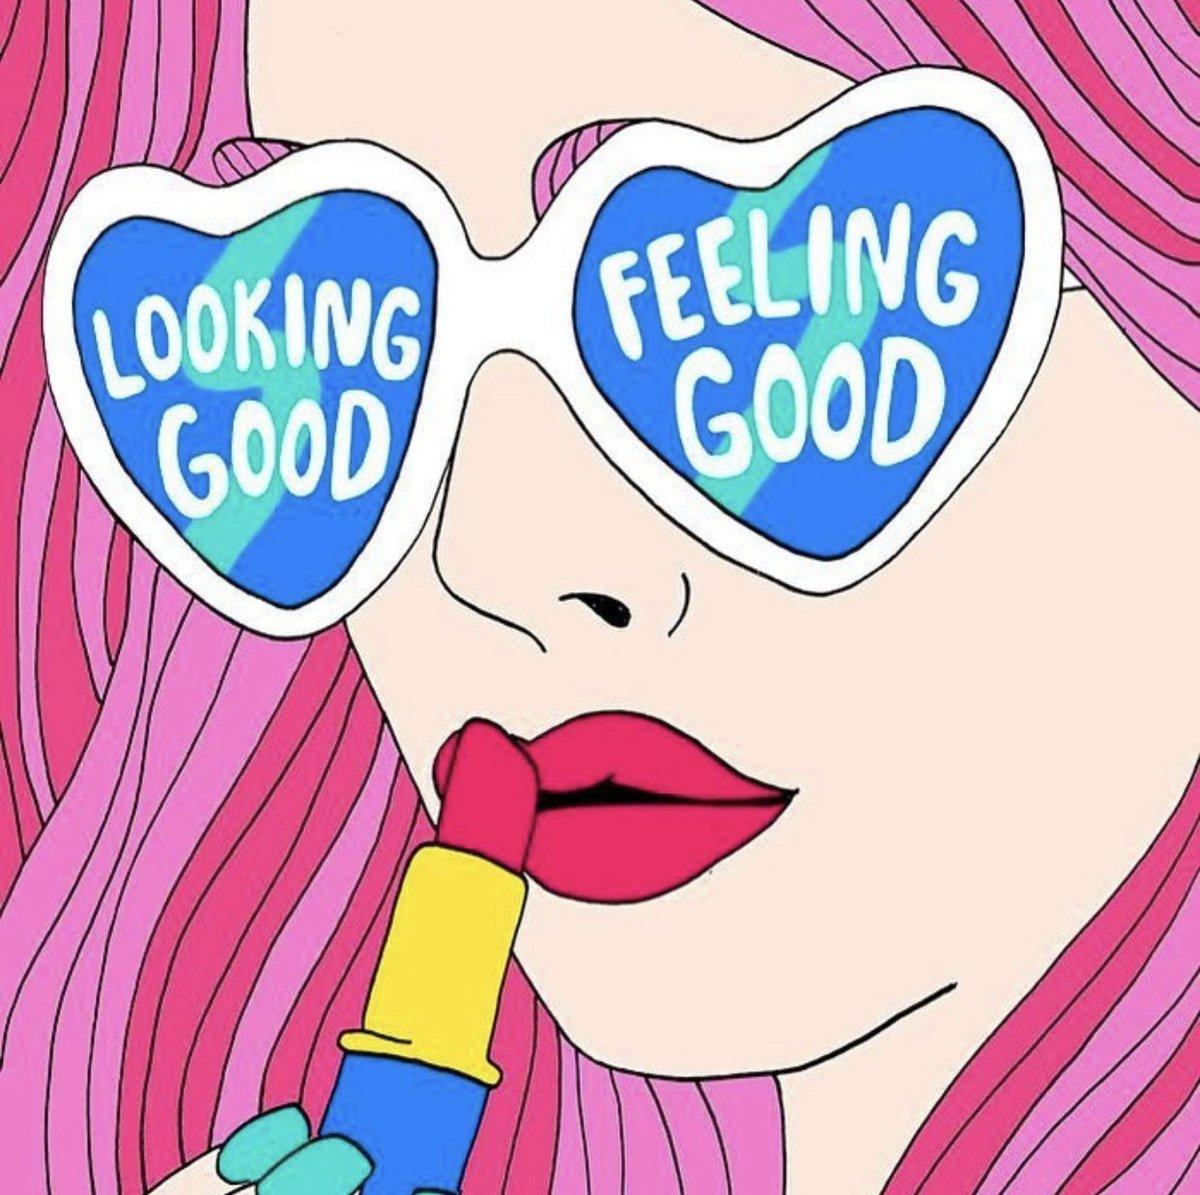 #Repost | justinavalentine  #MOOD . . . . #LookingGood #FeelingGood #LoveThis #PostiveVibes #PostiveEnergy #Makeup #Beauty #LipStick #TheGoal #MUAS #MUA #MindFrame #Attitude #Women #Woman #Girls #Ladies #quoteoftheday #quotes #justinavalentine 💓